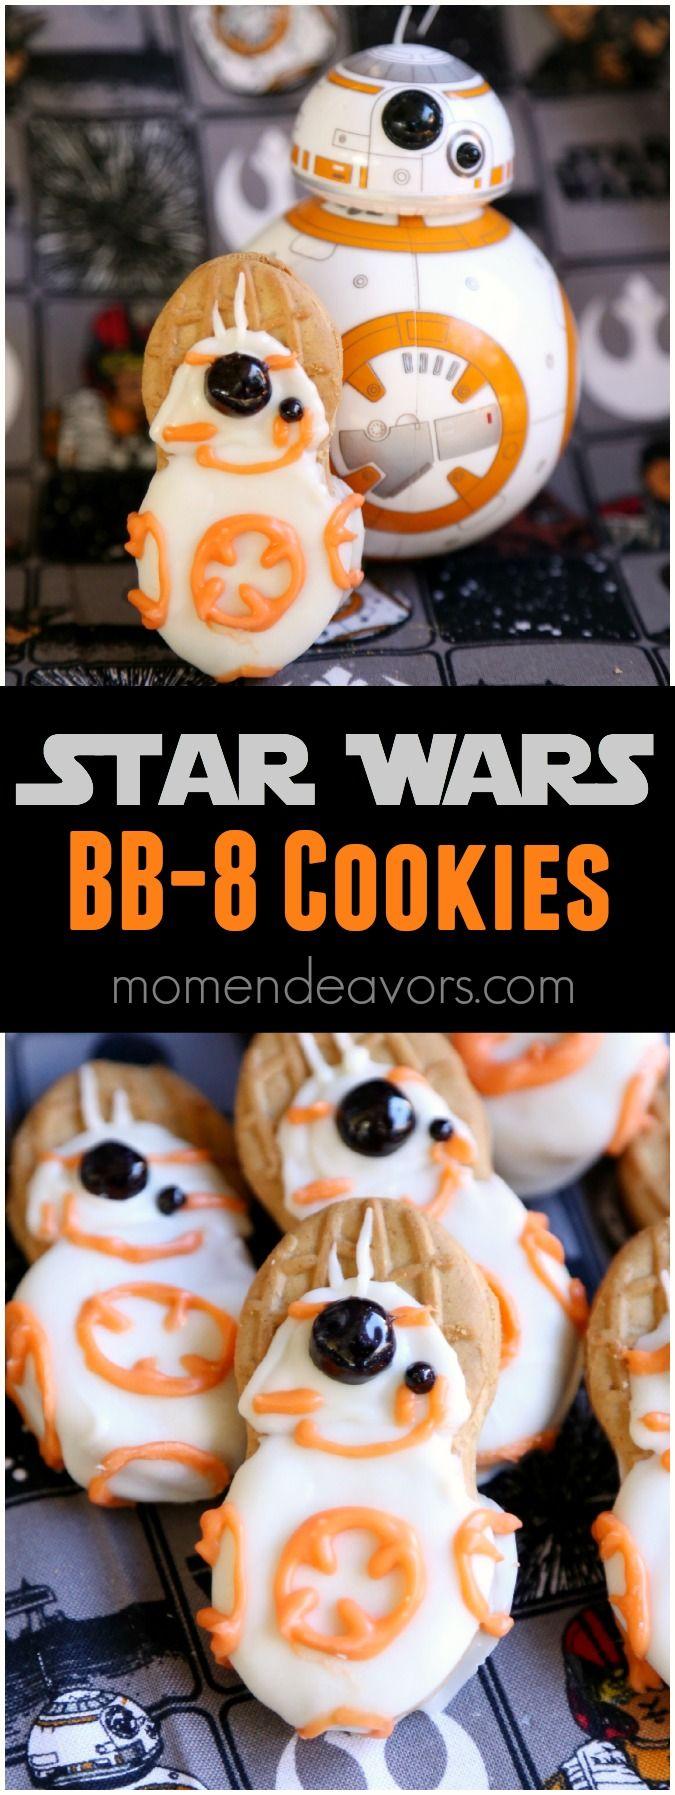 Star Wars The Force Awakens BB-8 No-Bake Cookies